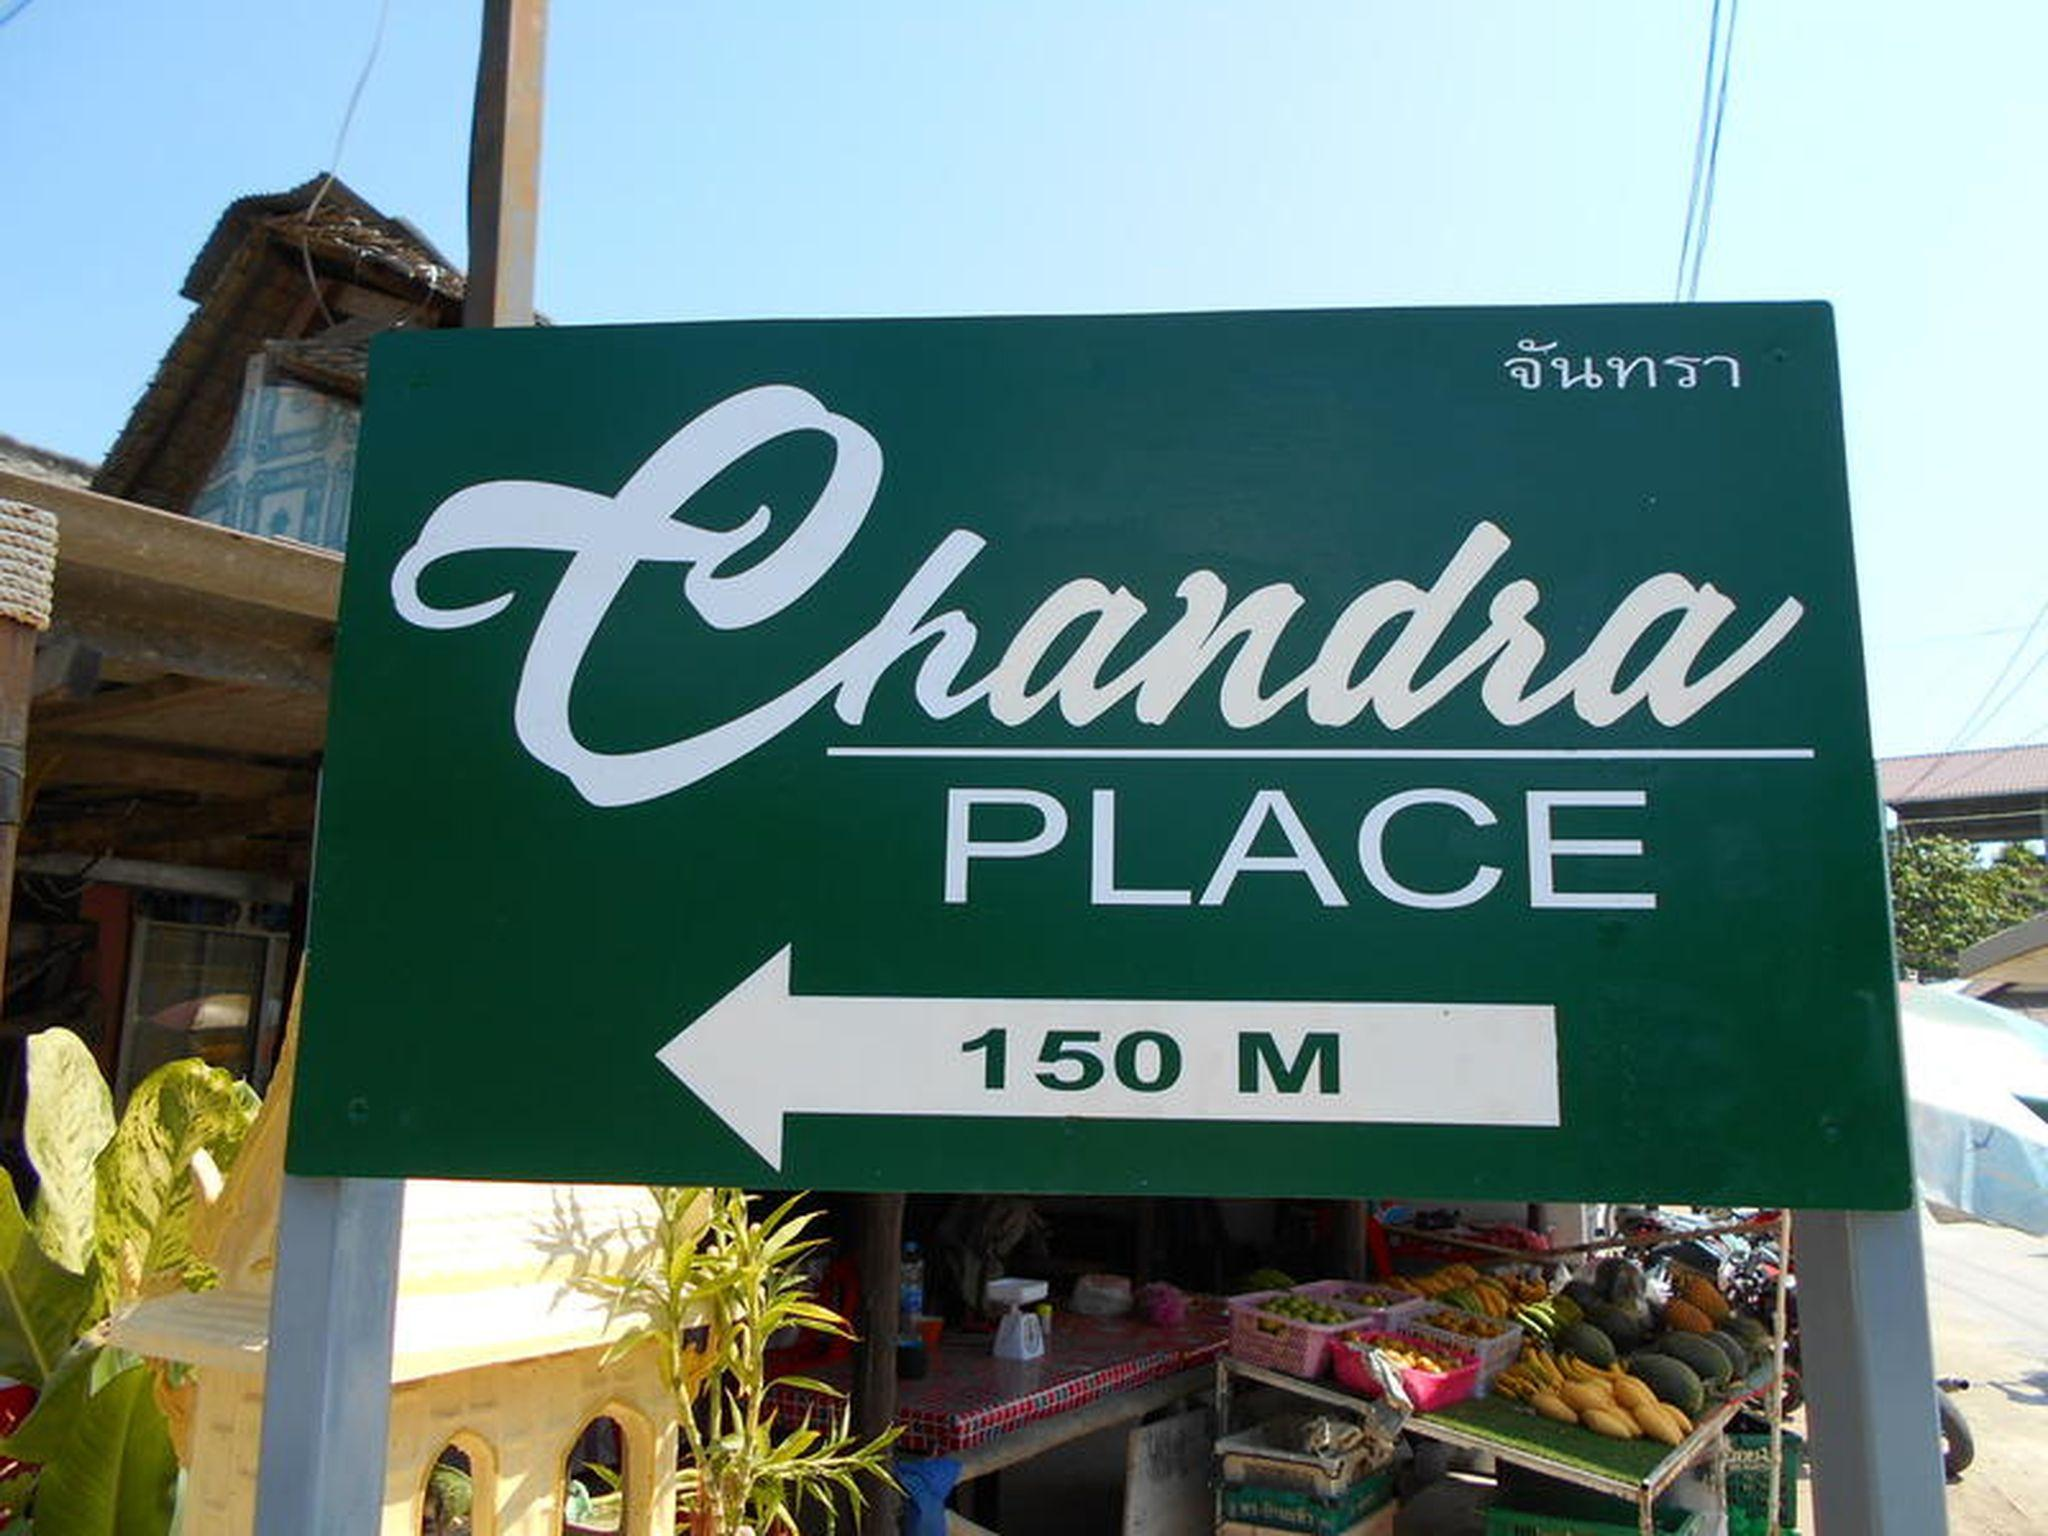 Chandra Place